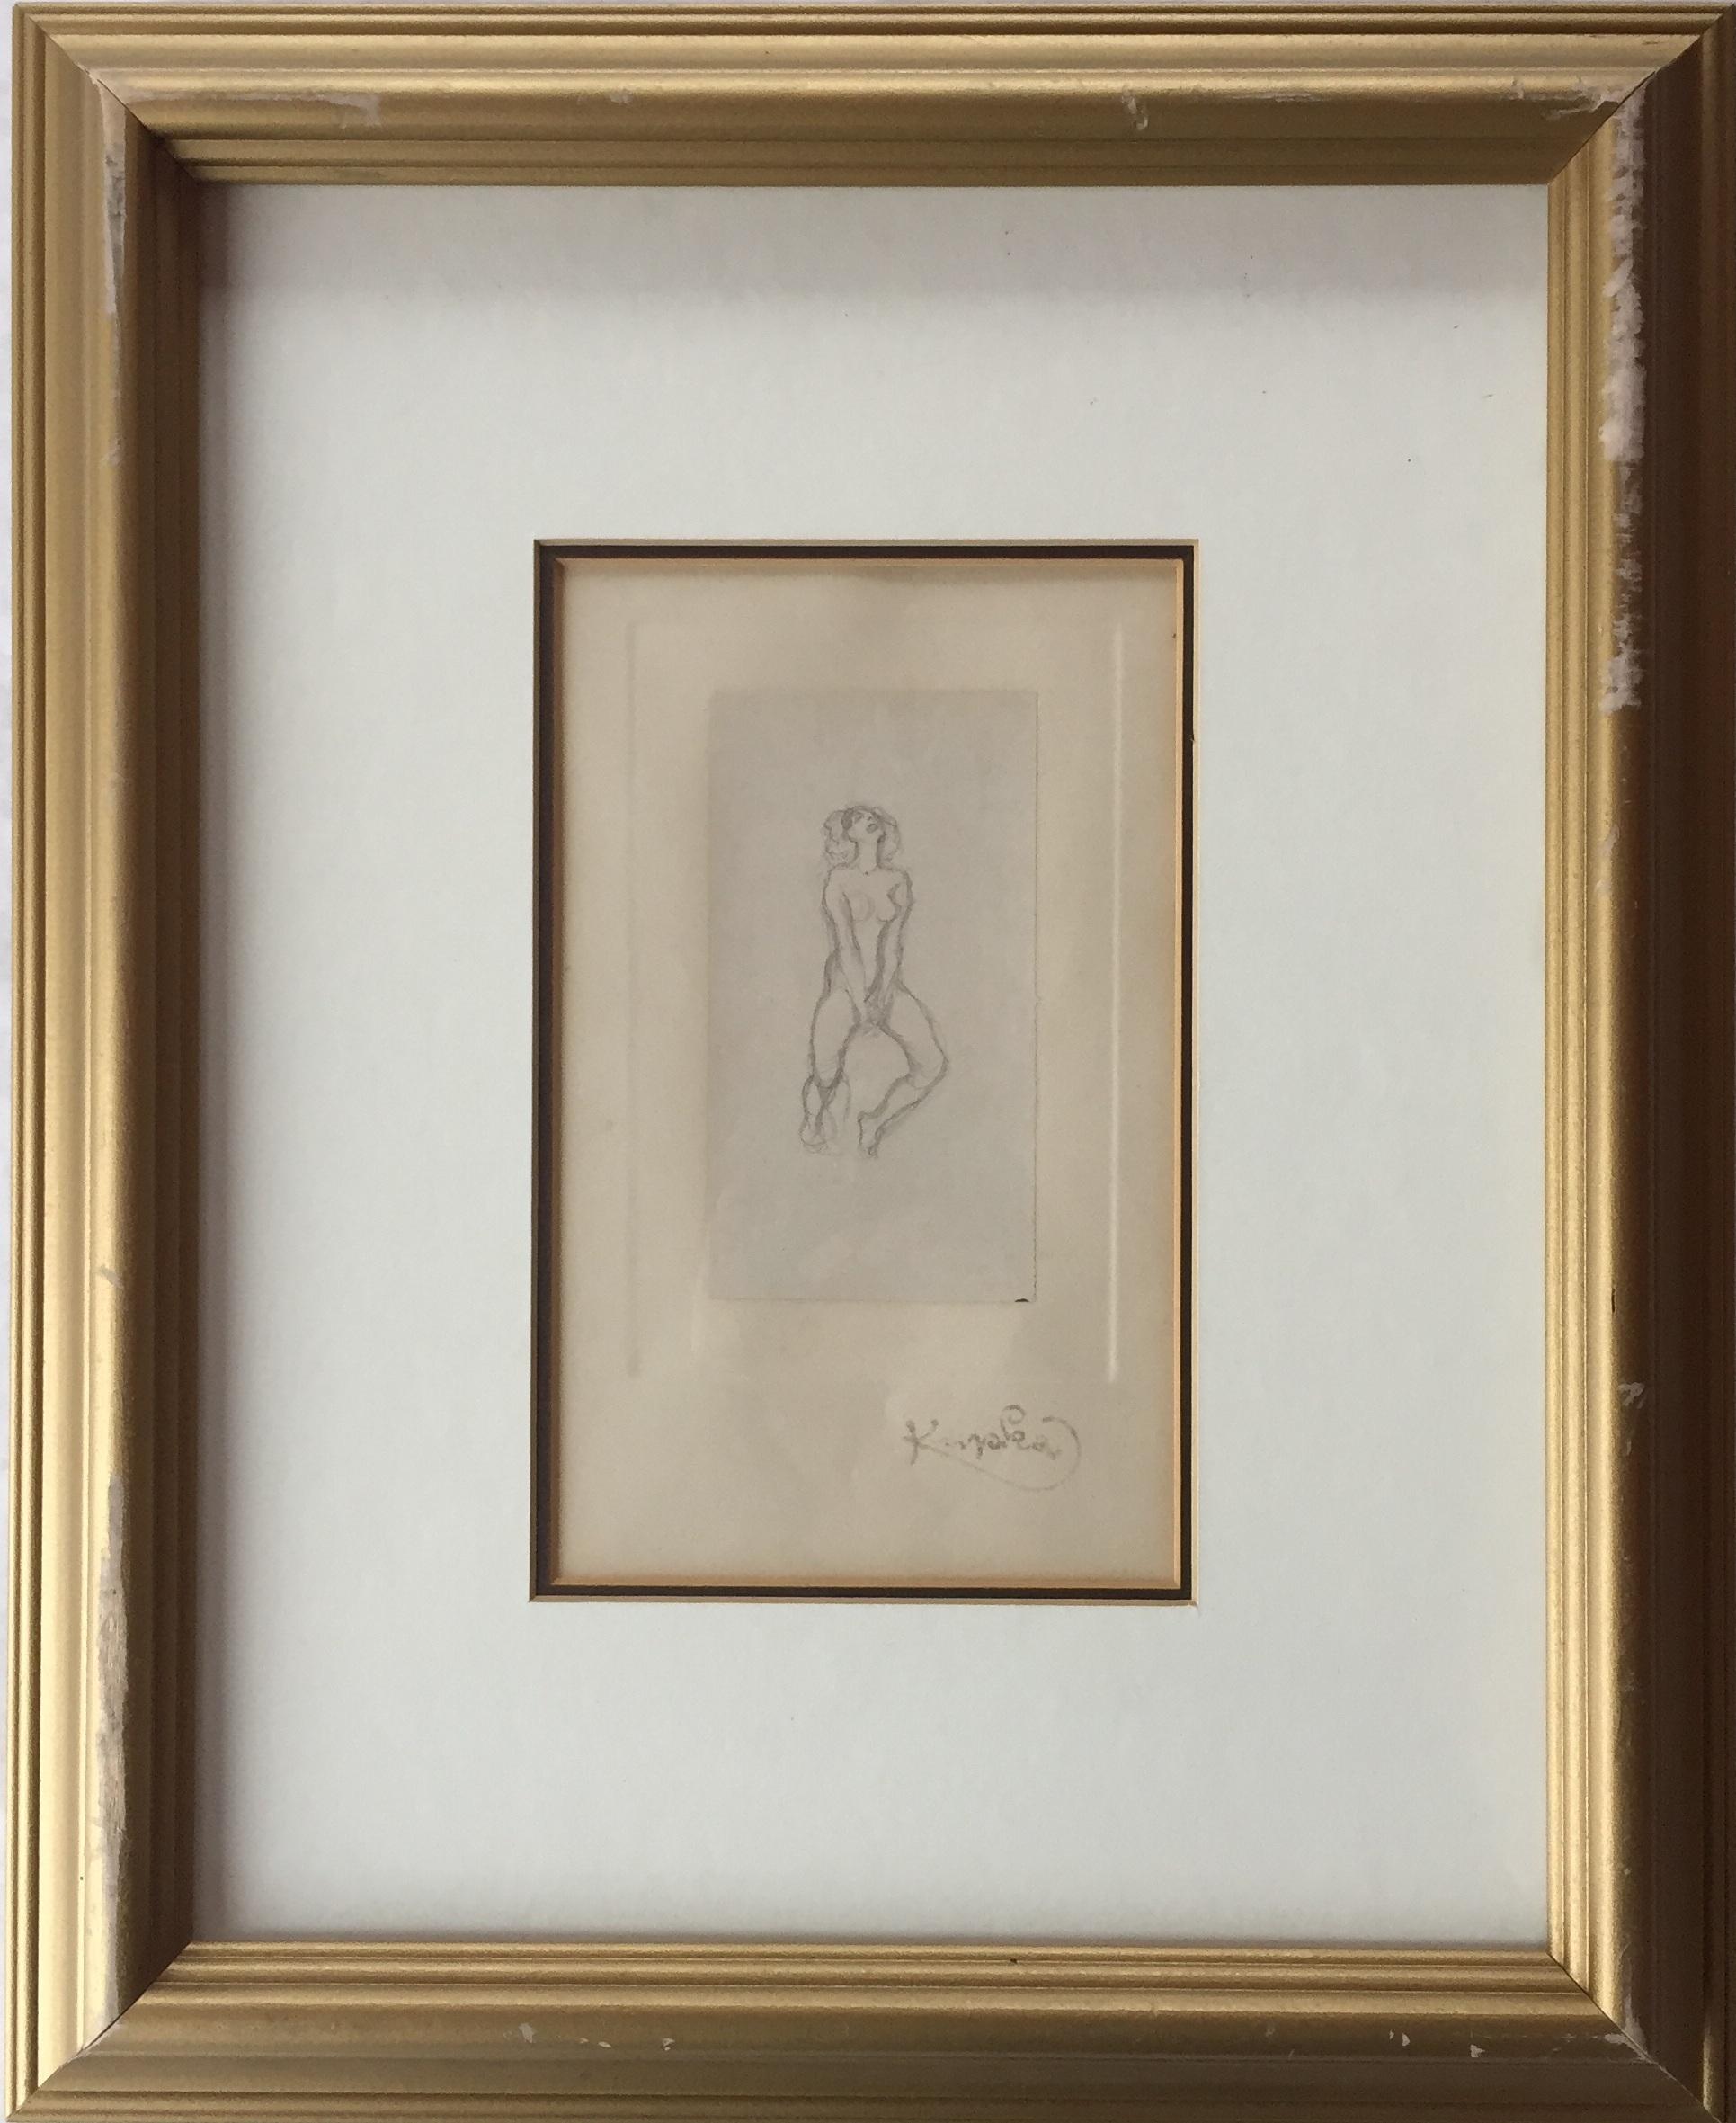 Frantisek Kupka(1871-1957) - Pencil on paper2.5